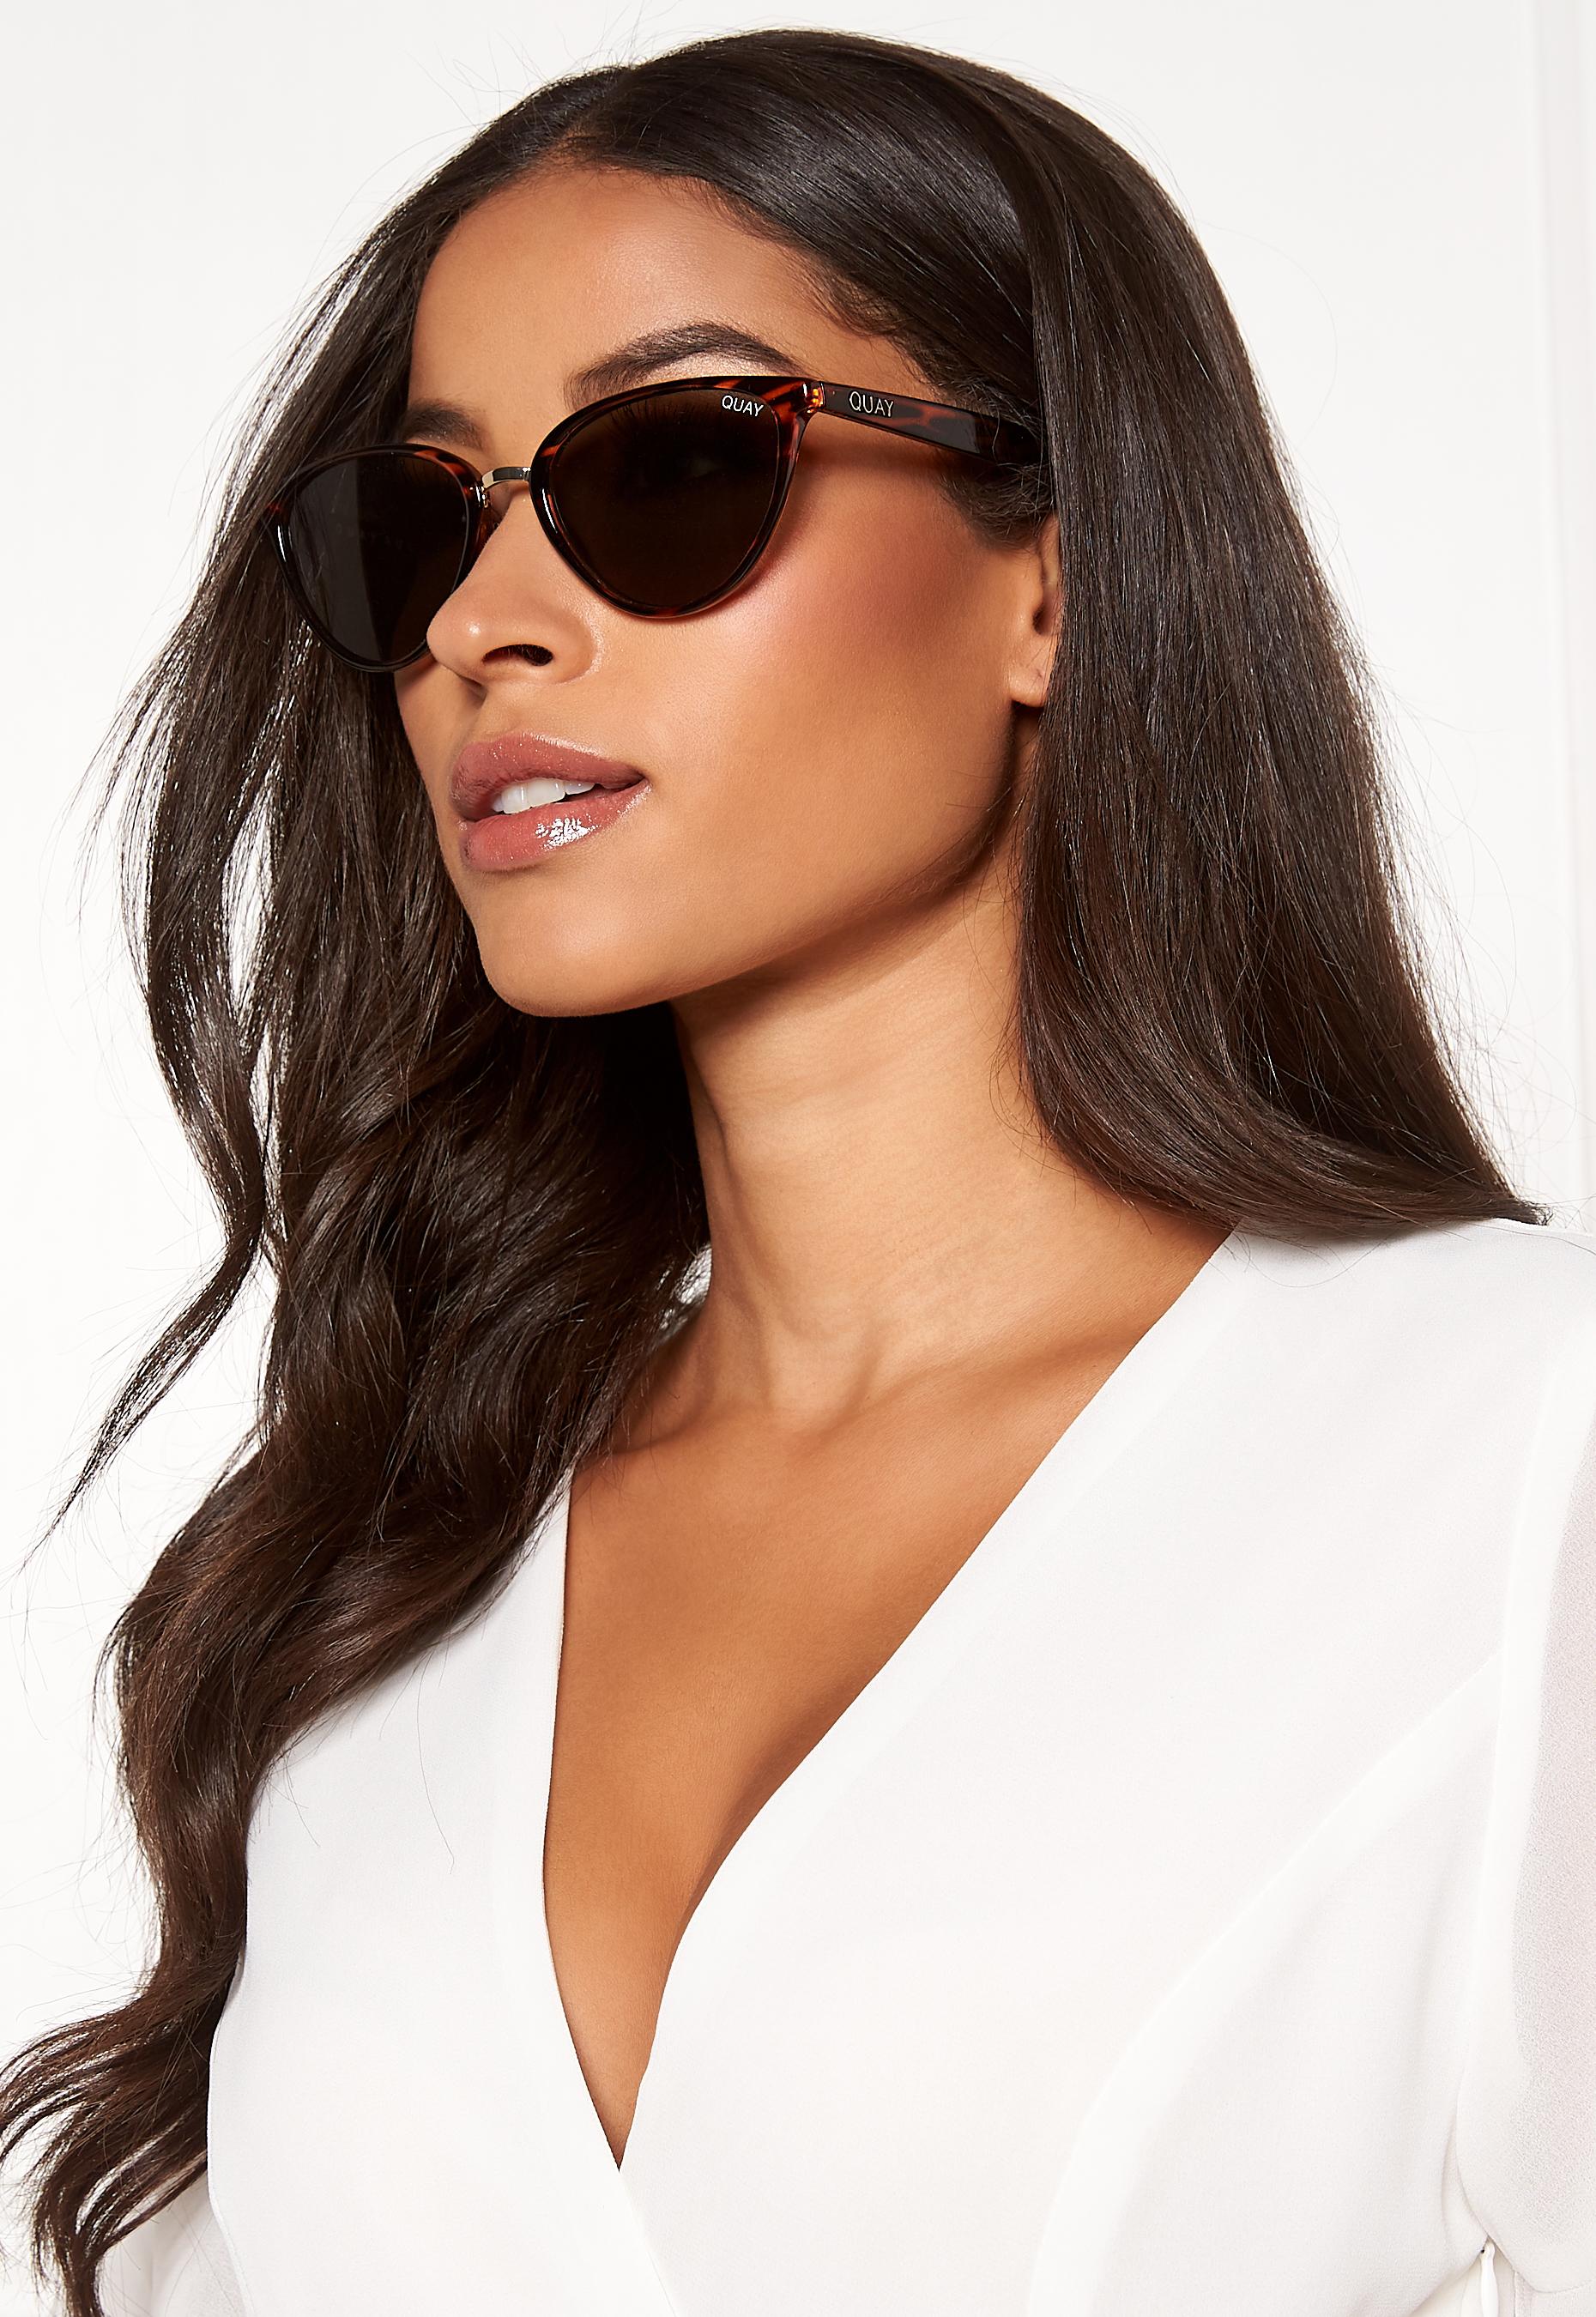 aa64134631bf9 Quay Australia Rumours Sunglasses Tort Green - Bubbleroom